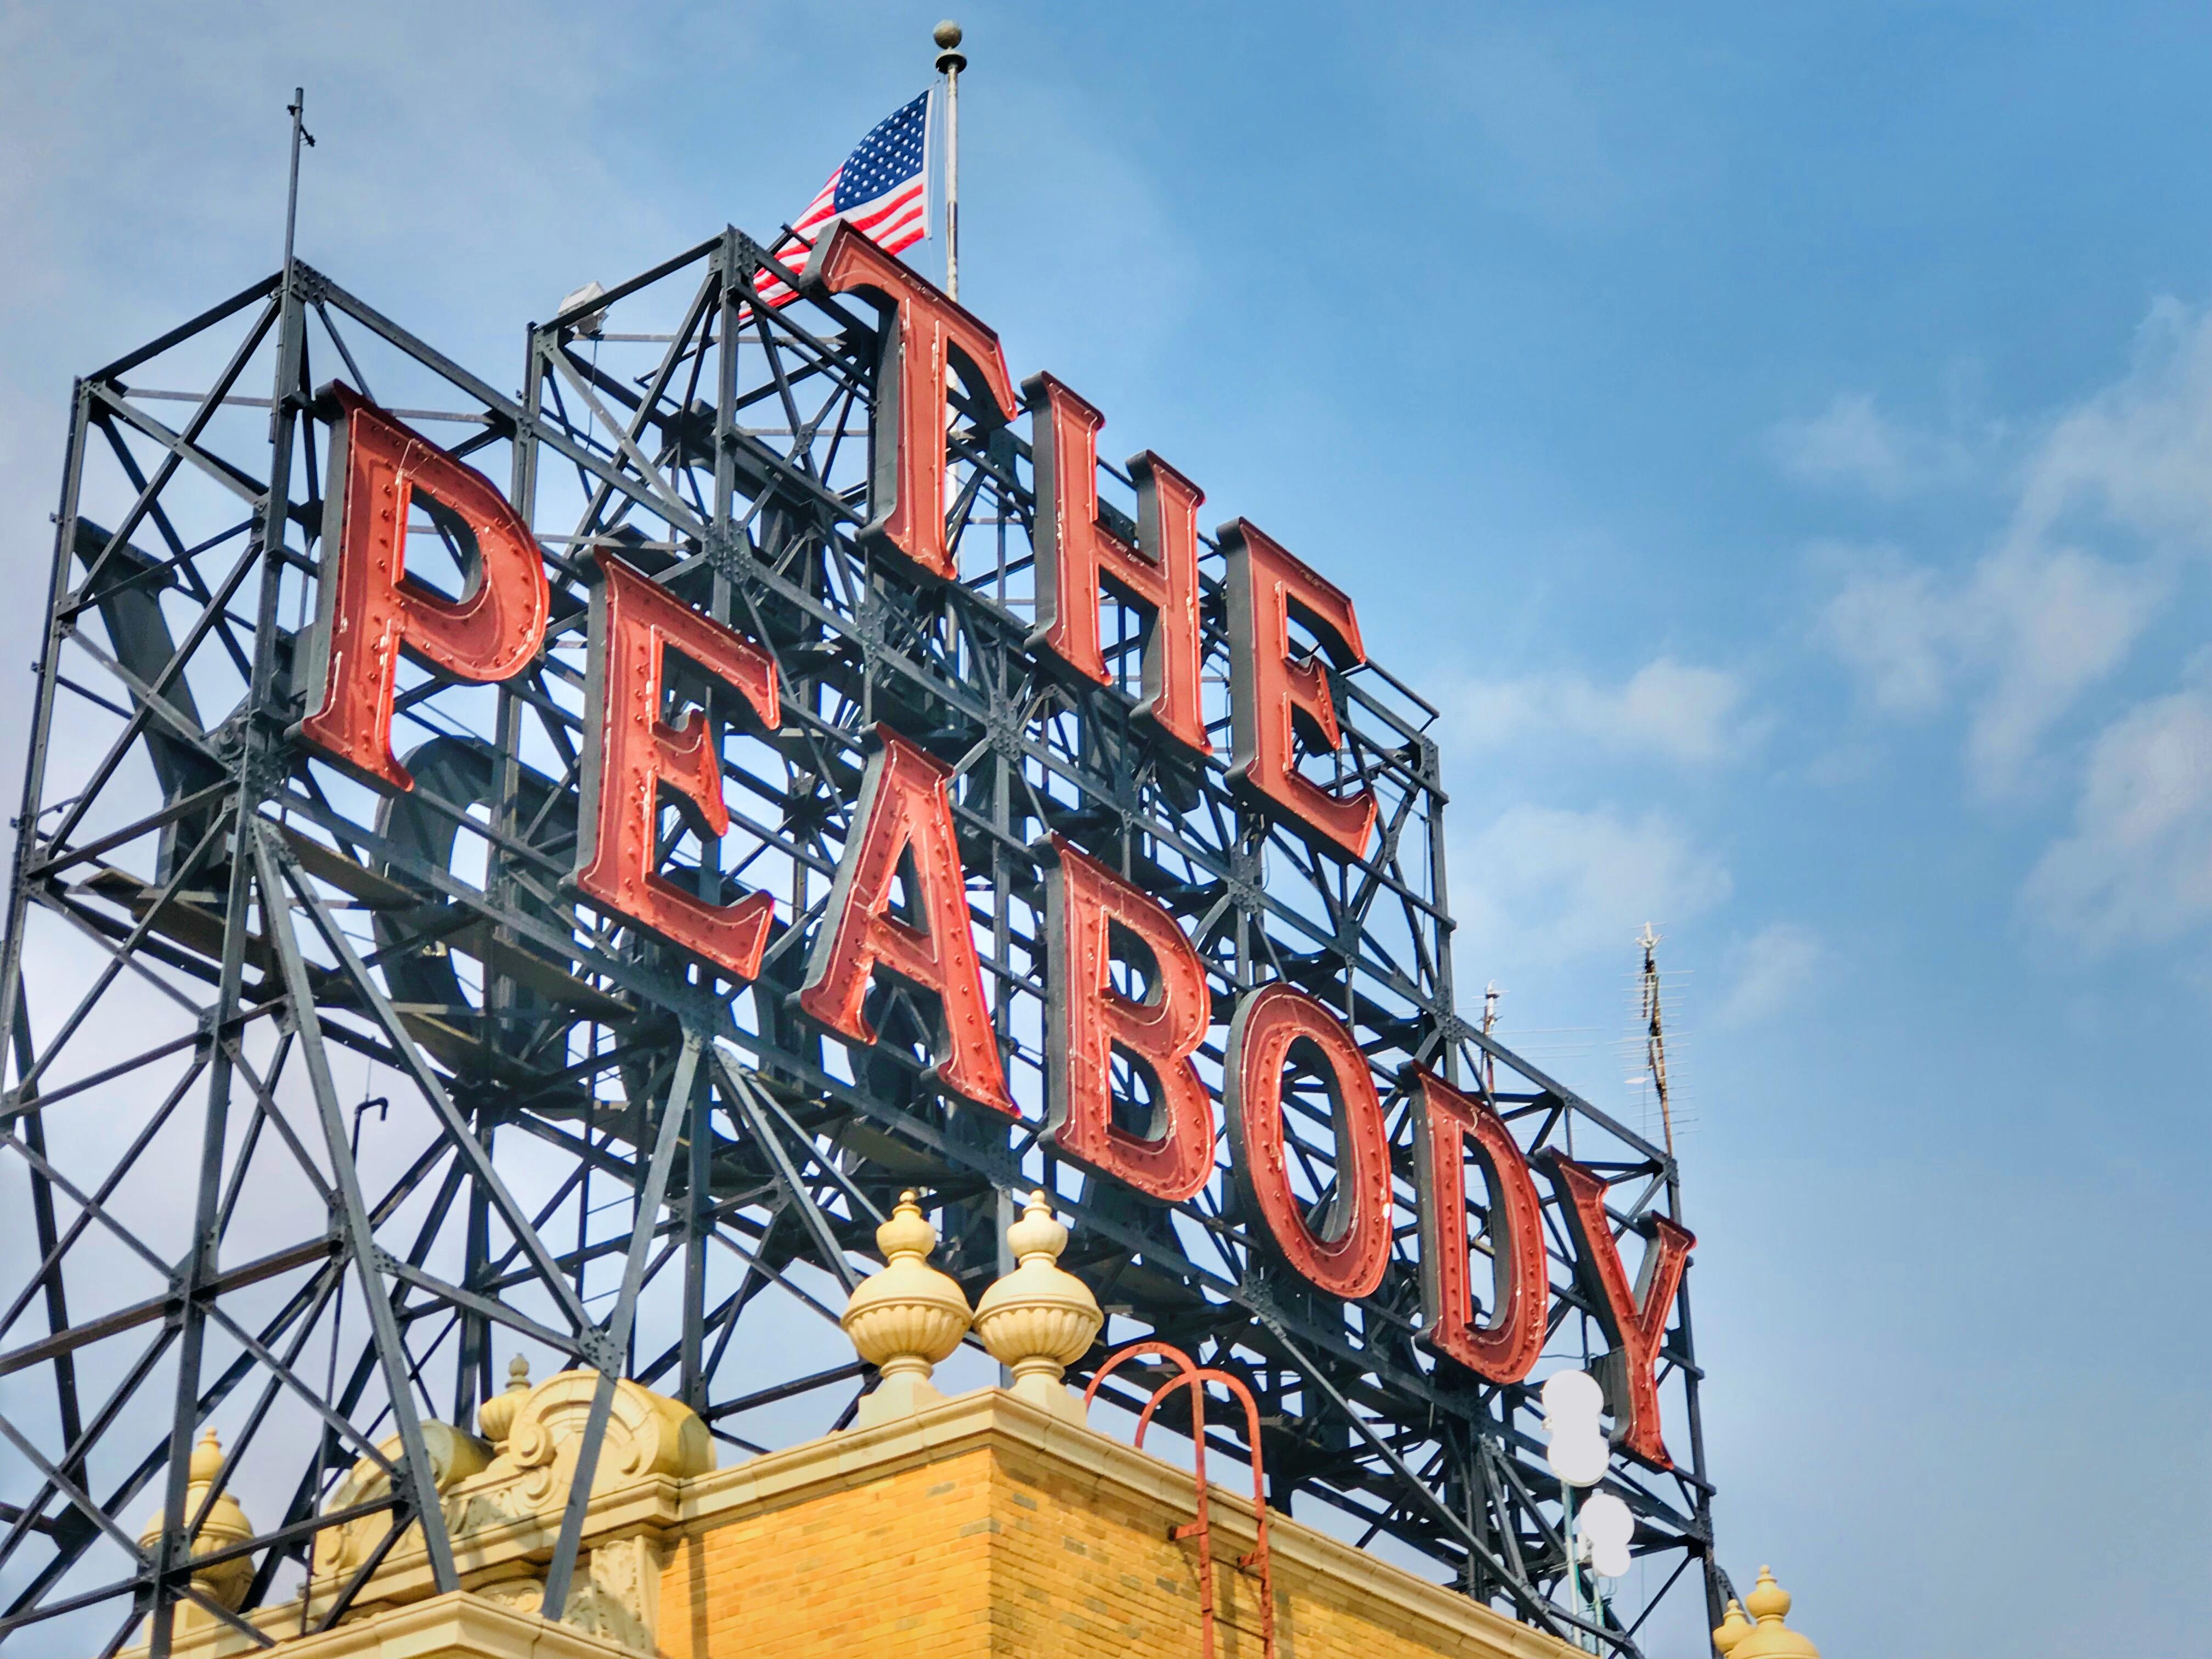 The Memphis Peabody Hotel, The Peabody Memphis Hotel, The Peabody Hotel